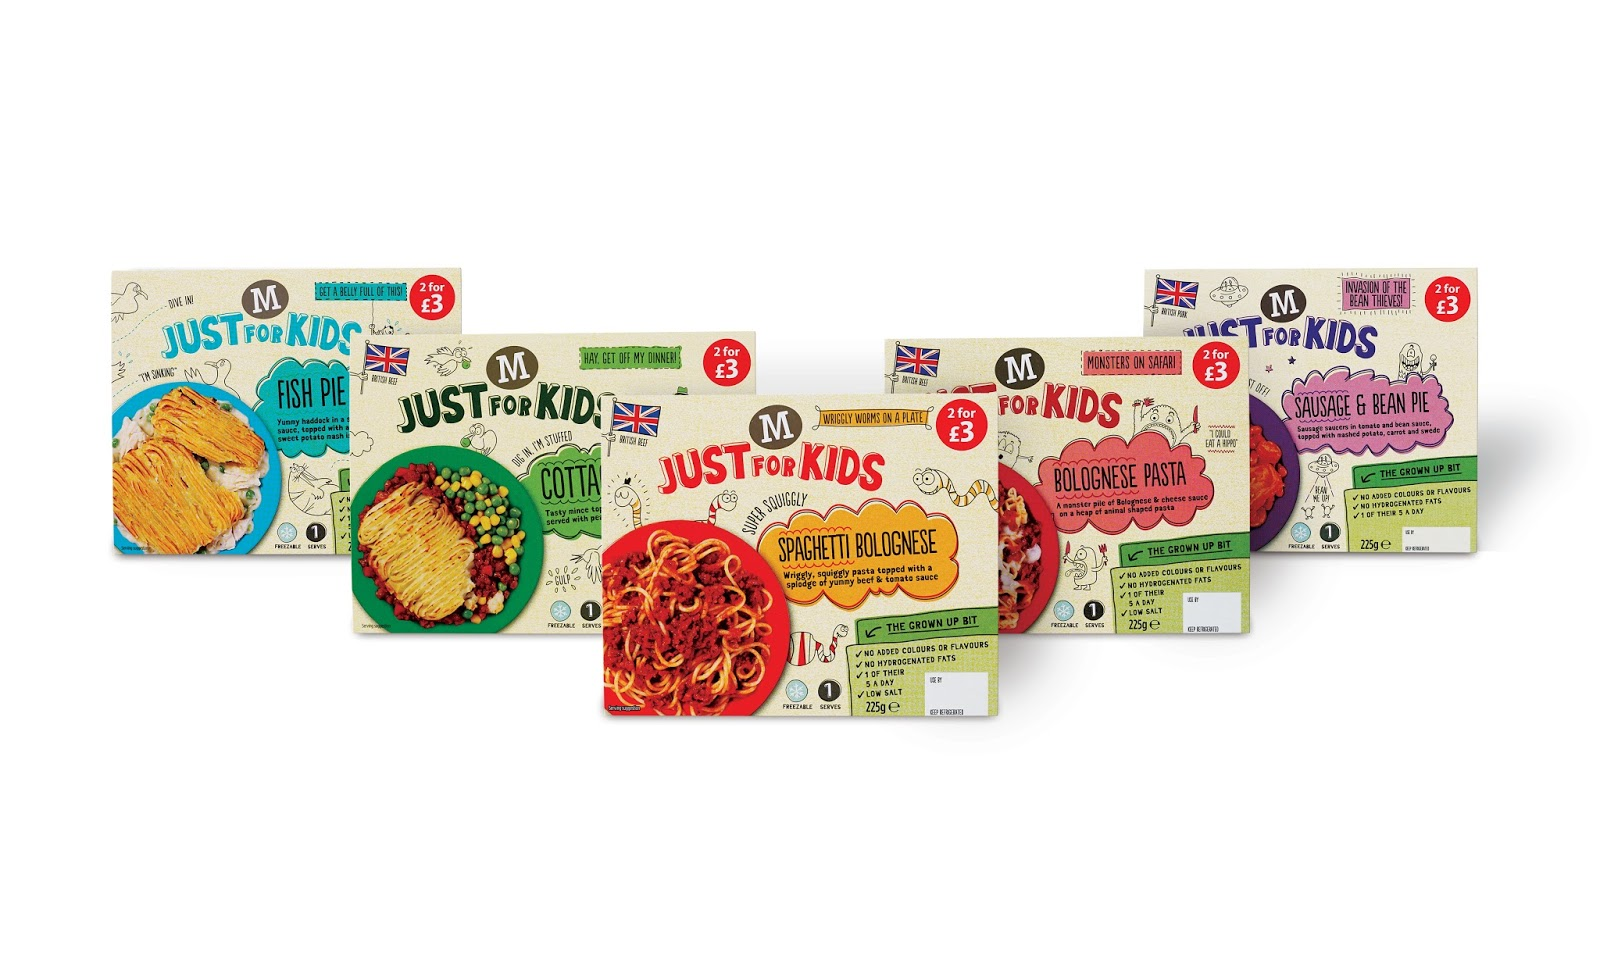 Childrens Packaging Design Ideas